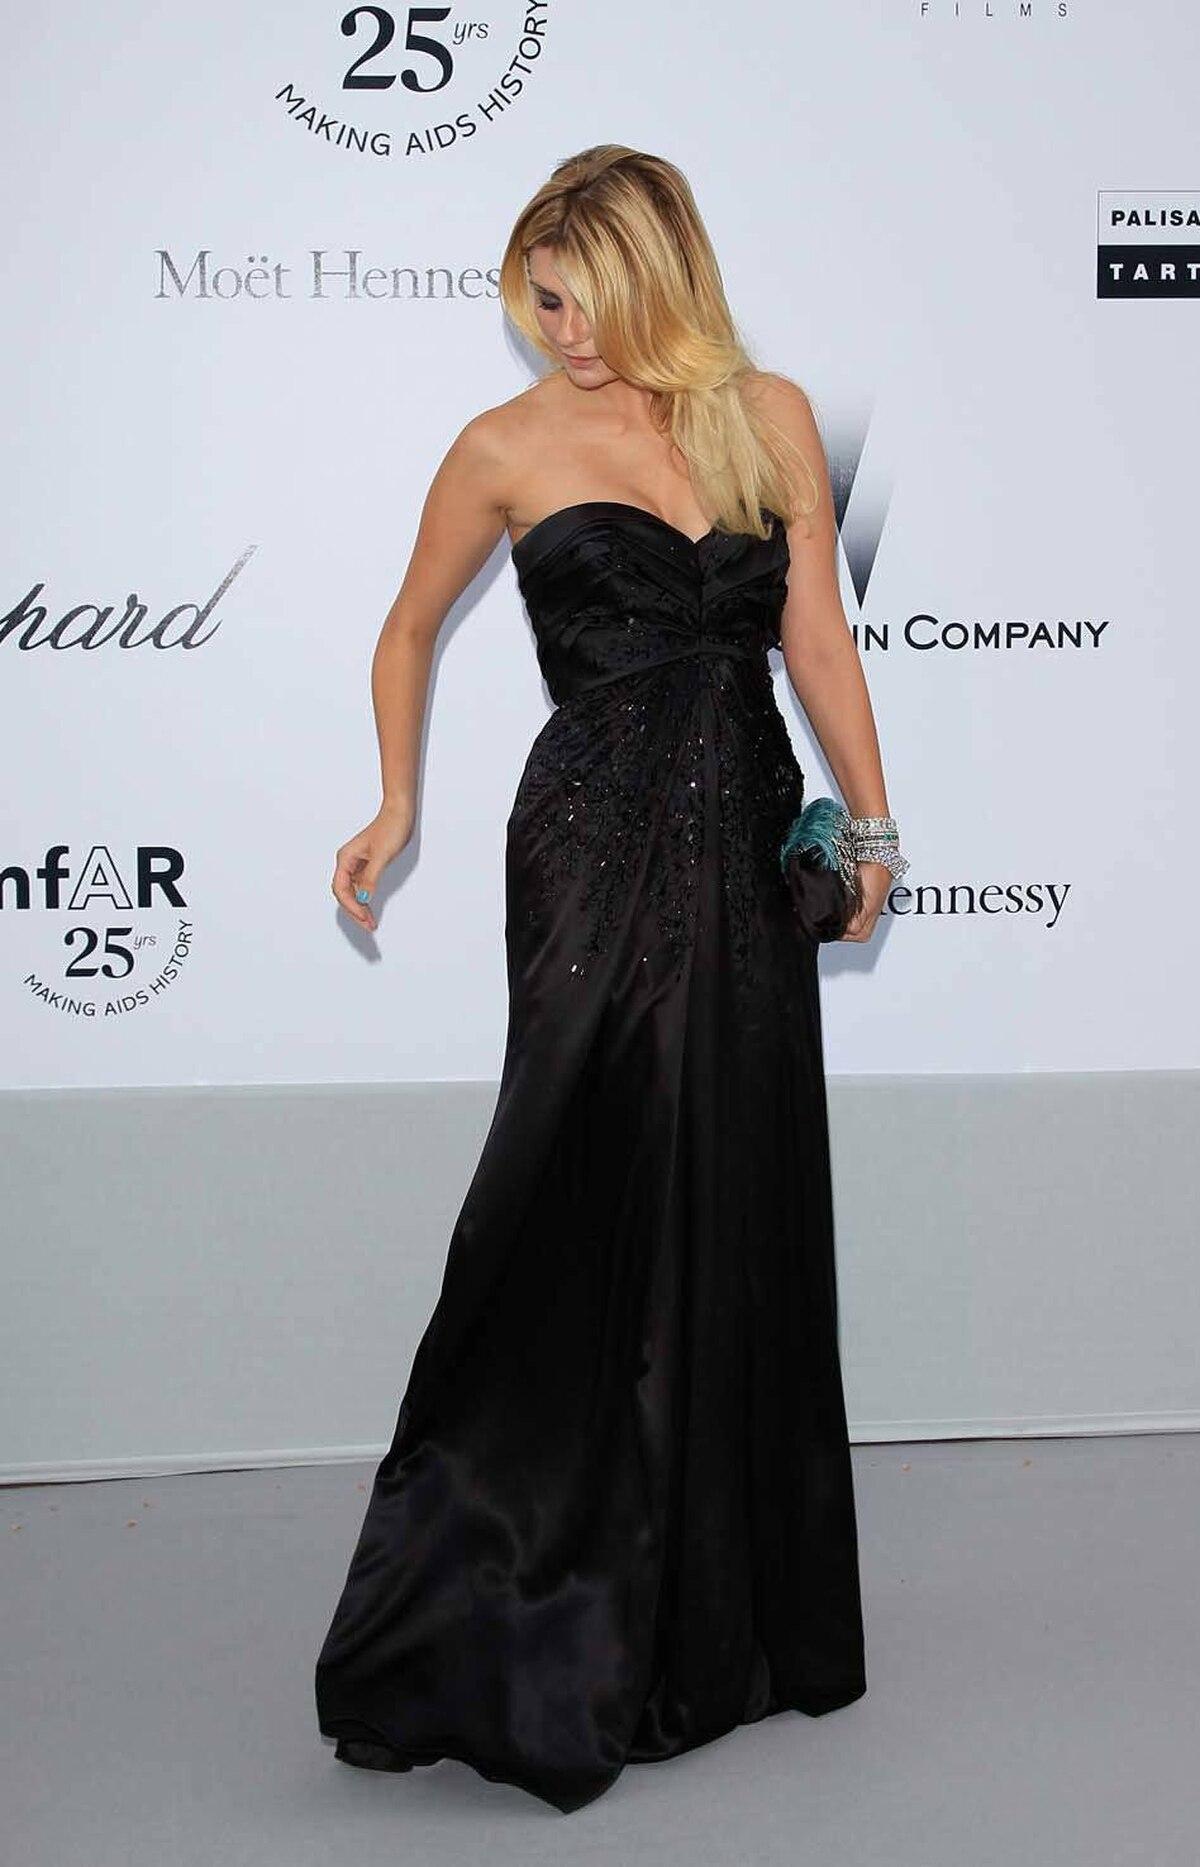 Mischa Barton attends amfAR's Cinema Against AIDS Gala at the Cannes Film Festival on Thursday.